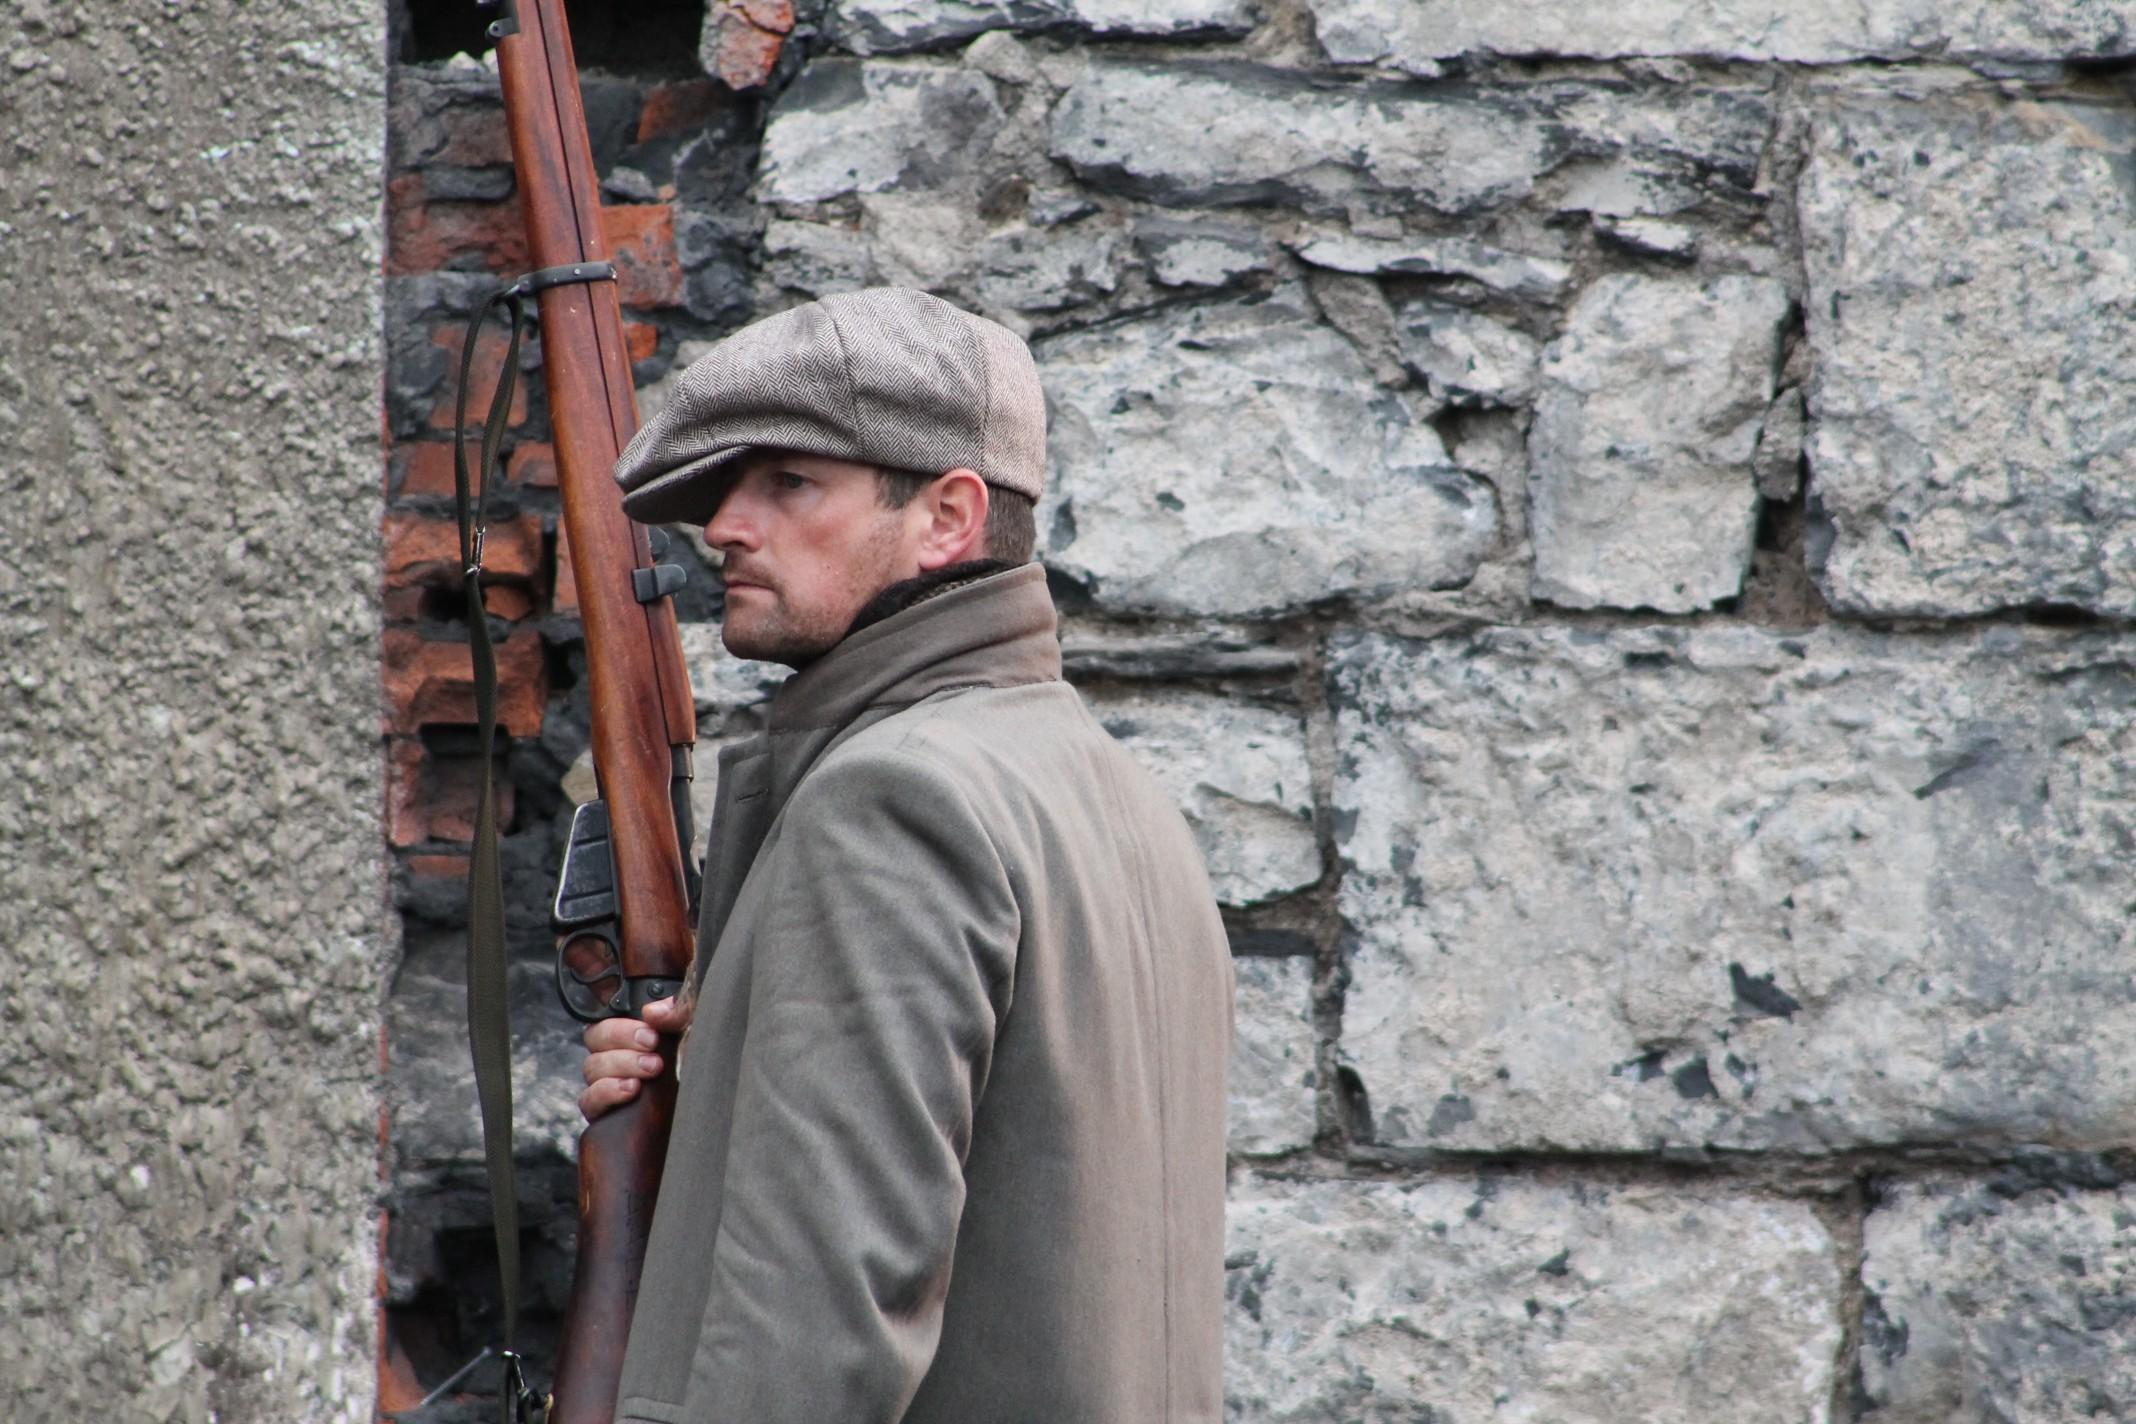 Irish Volunteer keeps lookout and awaits battle